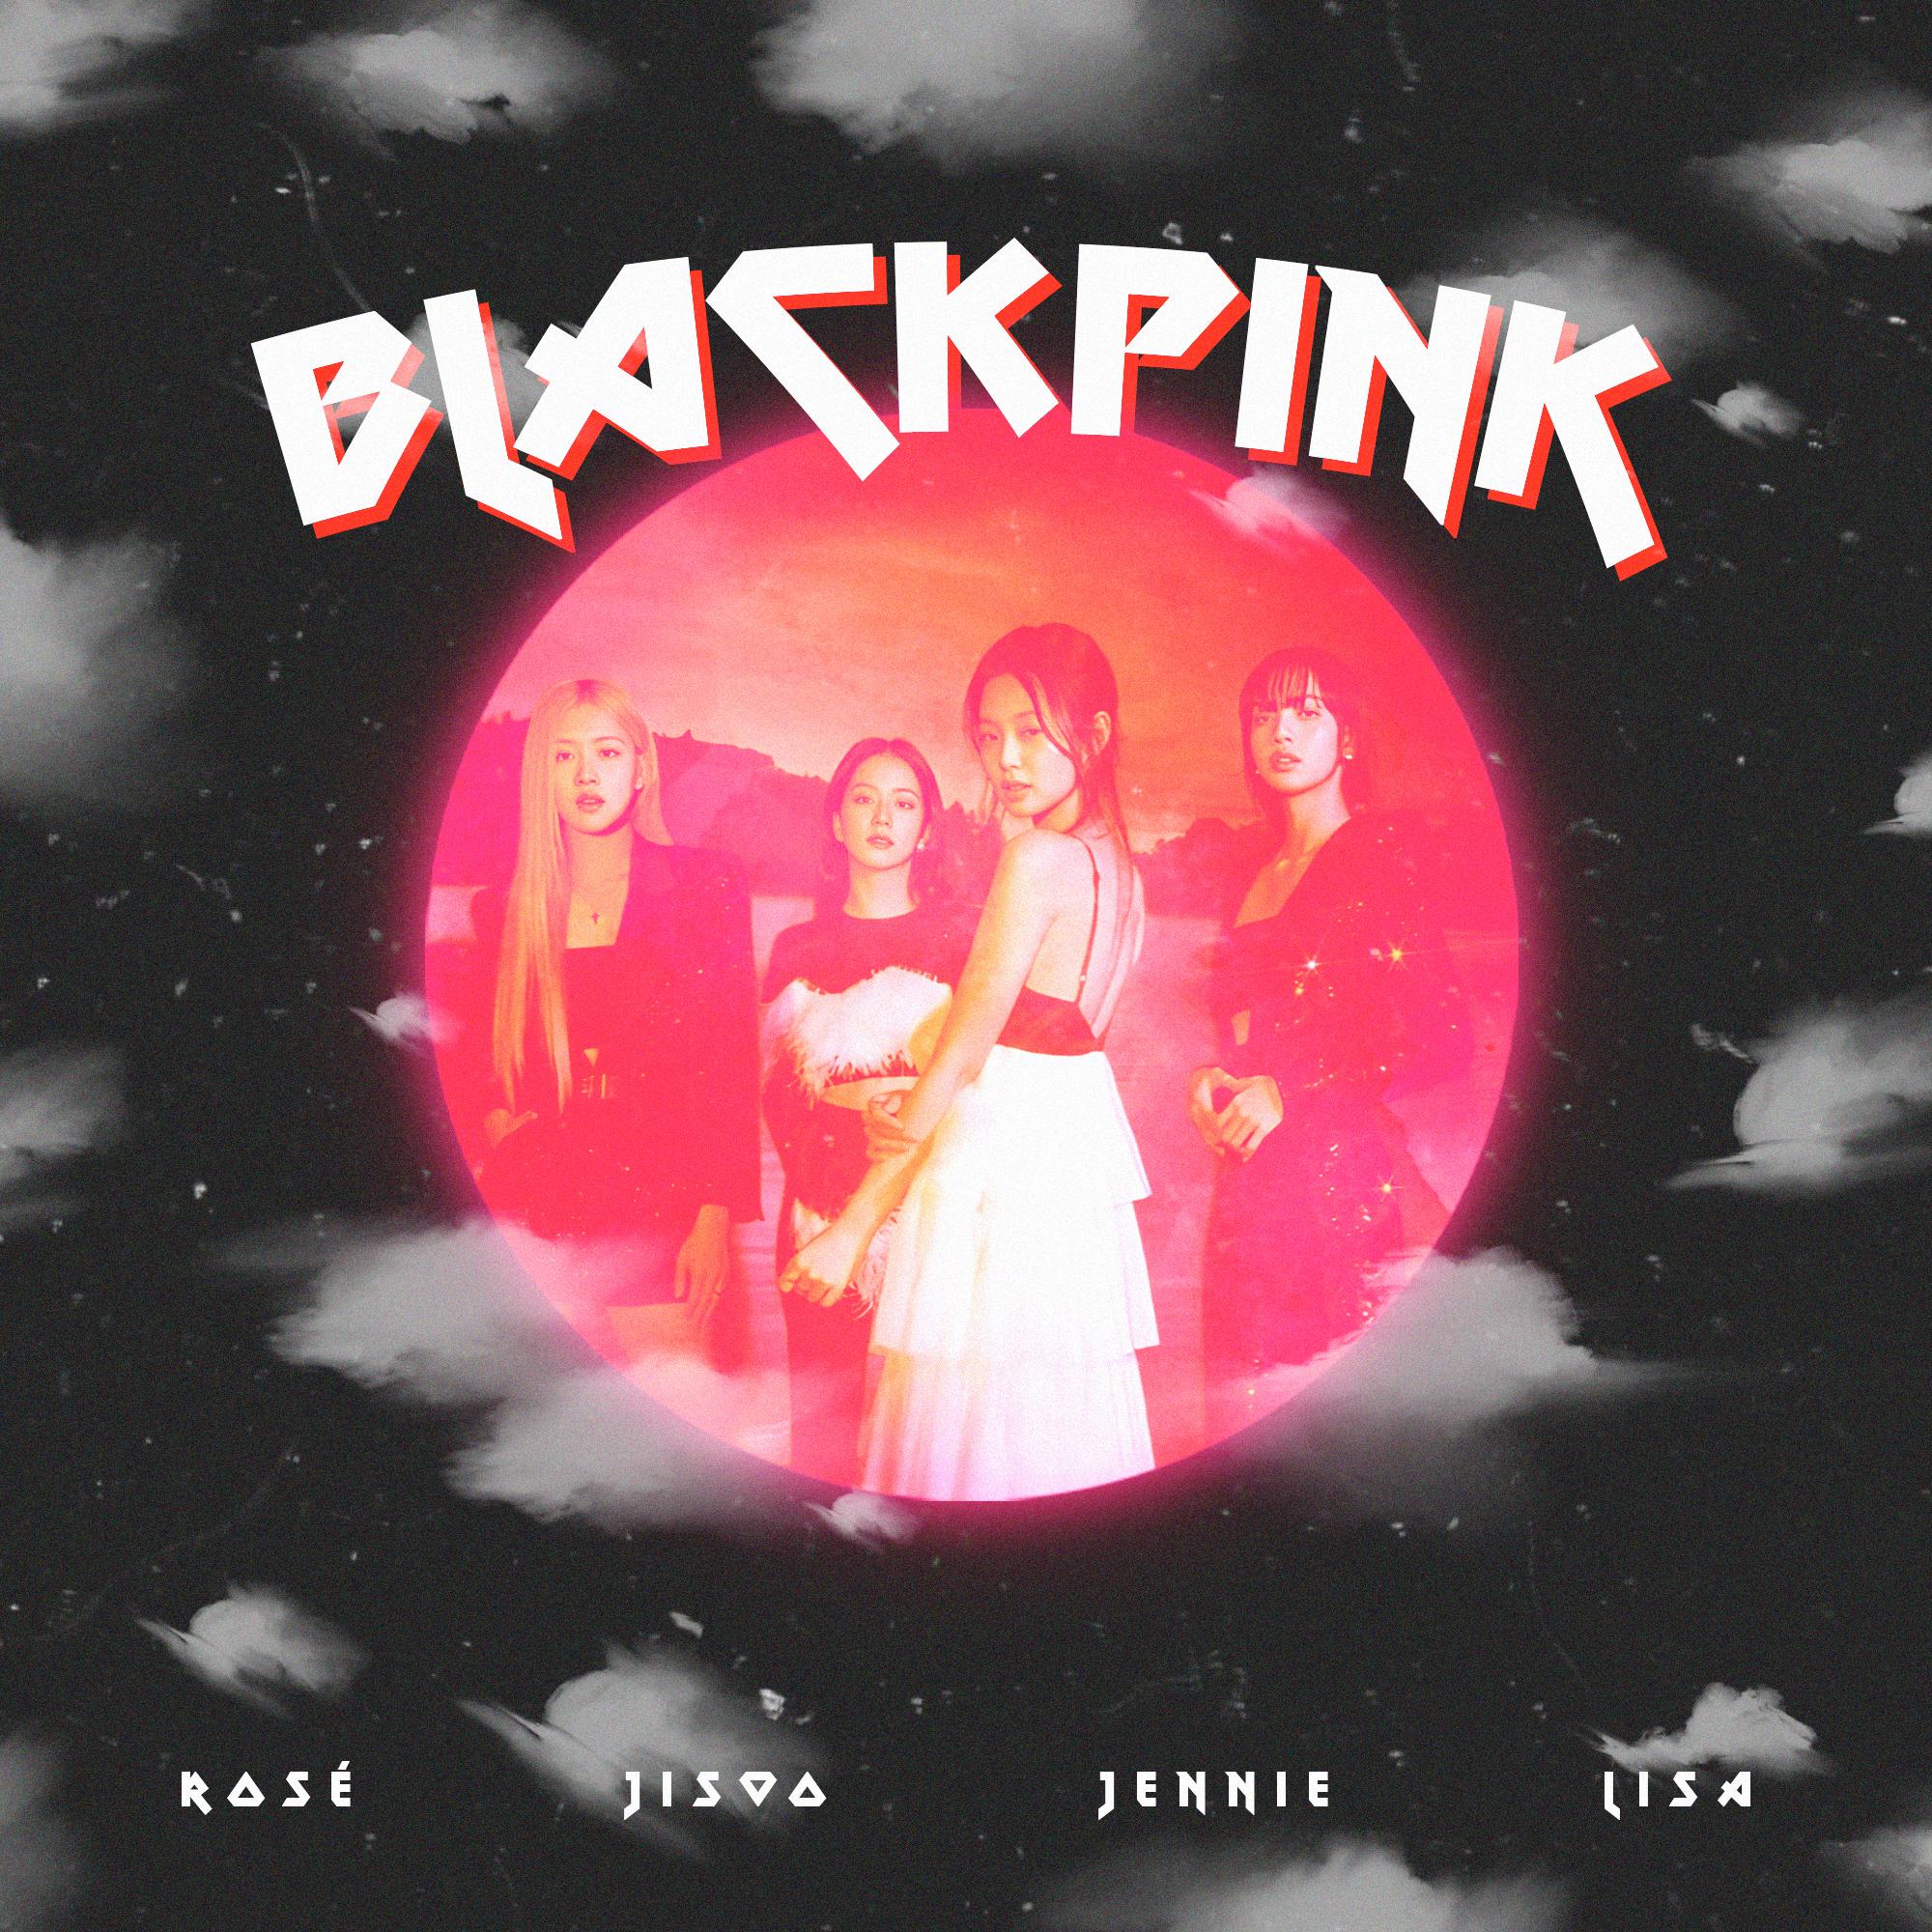 #rosé #jisoo #jennie #lisa #blackpink #kpopedit #fanmade